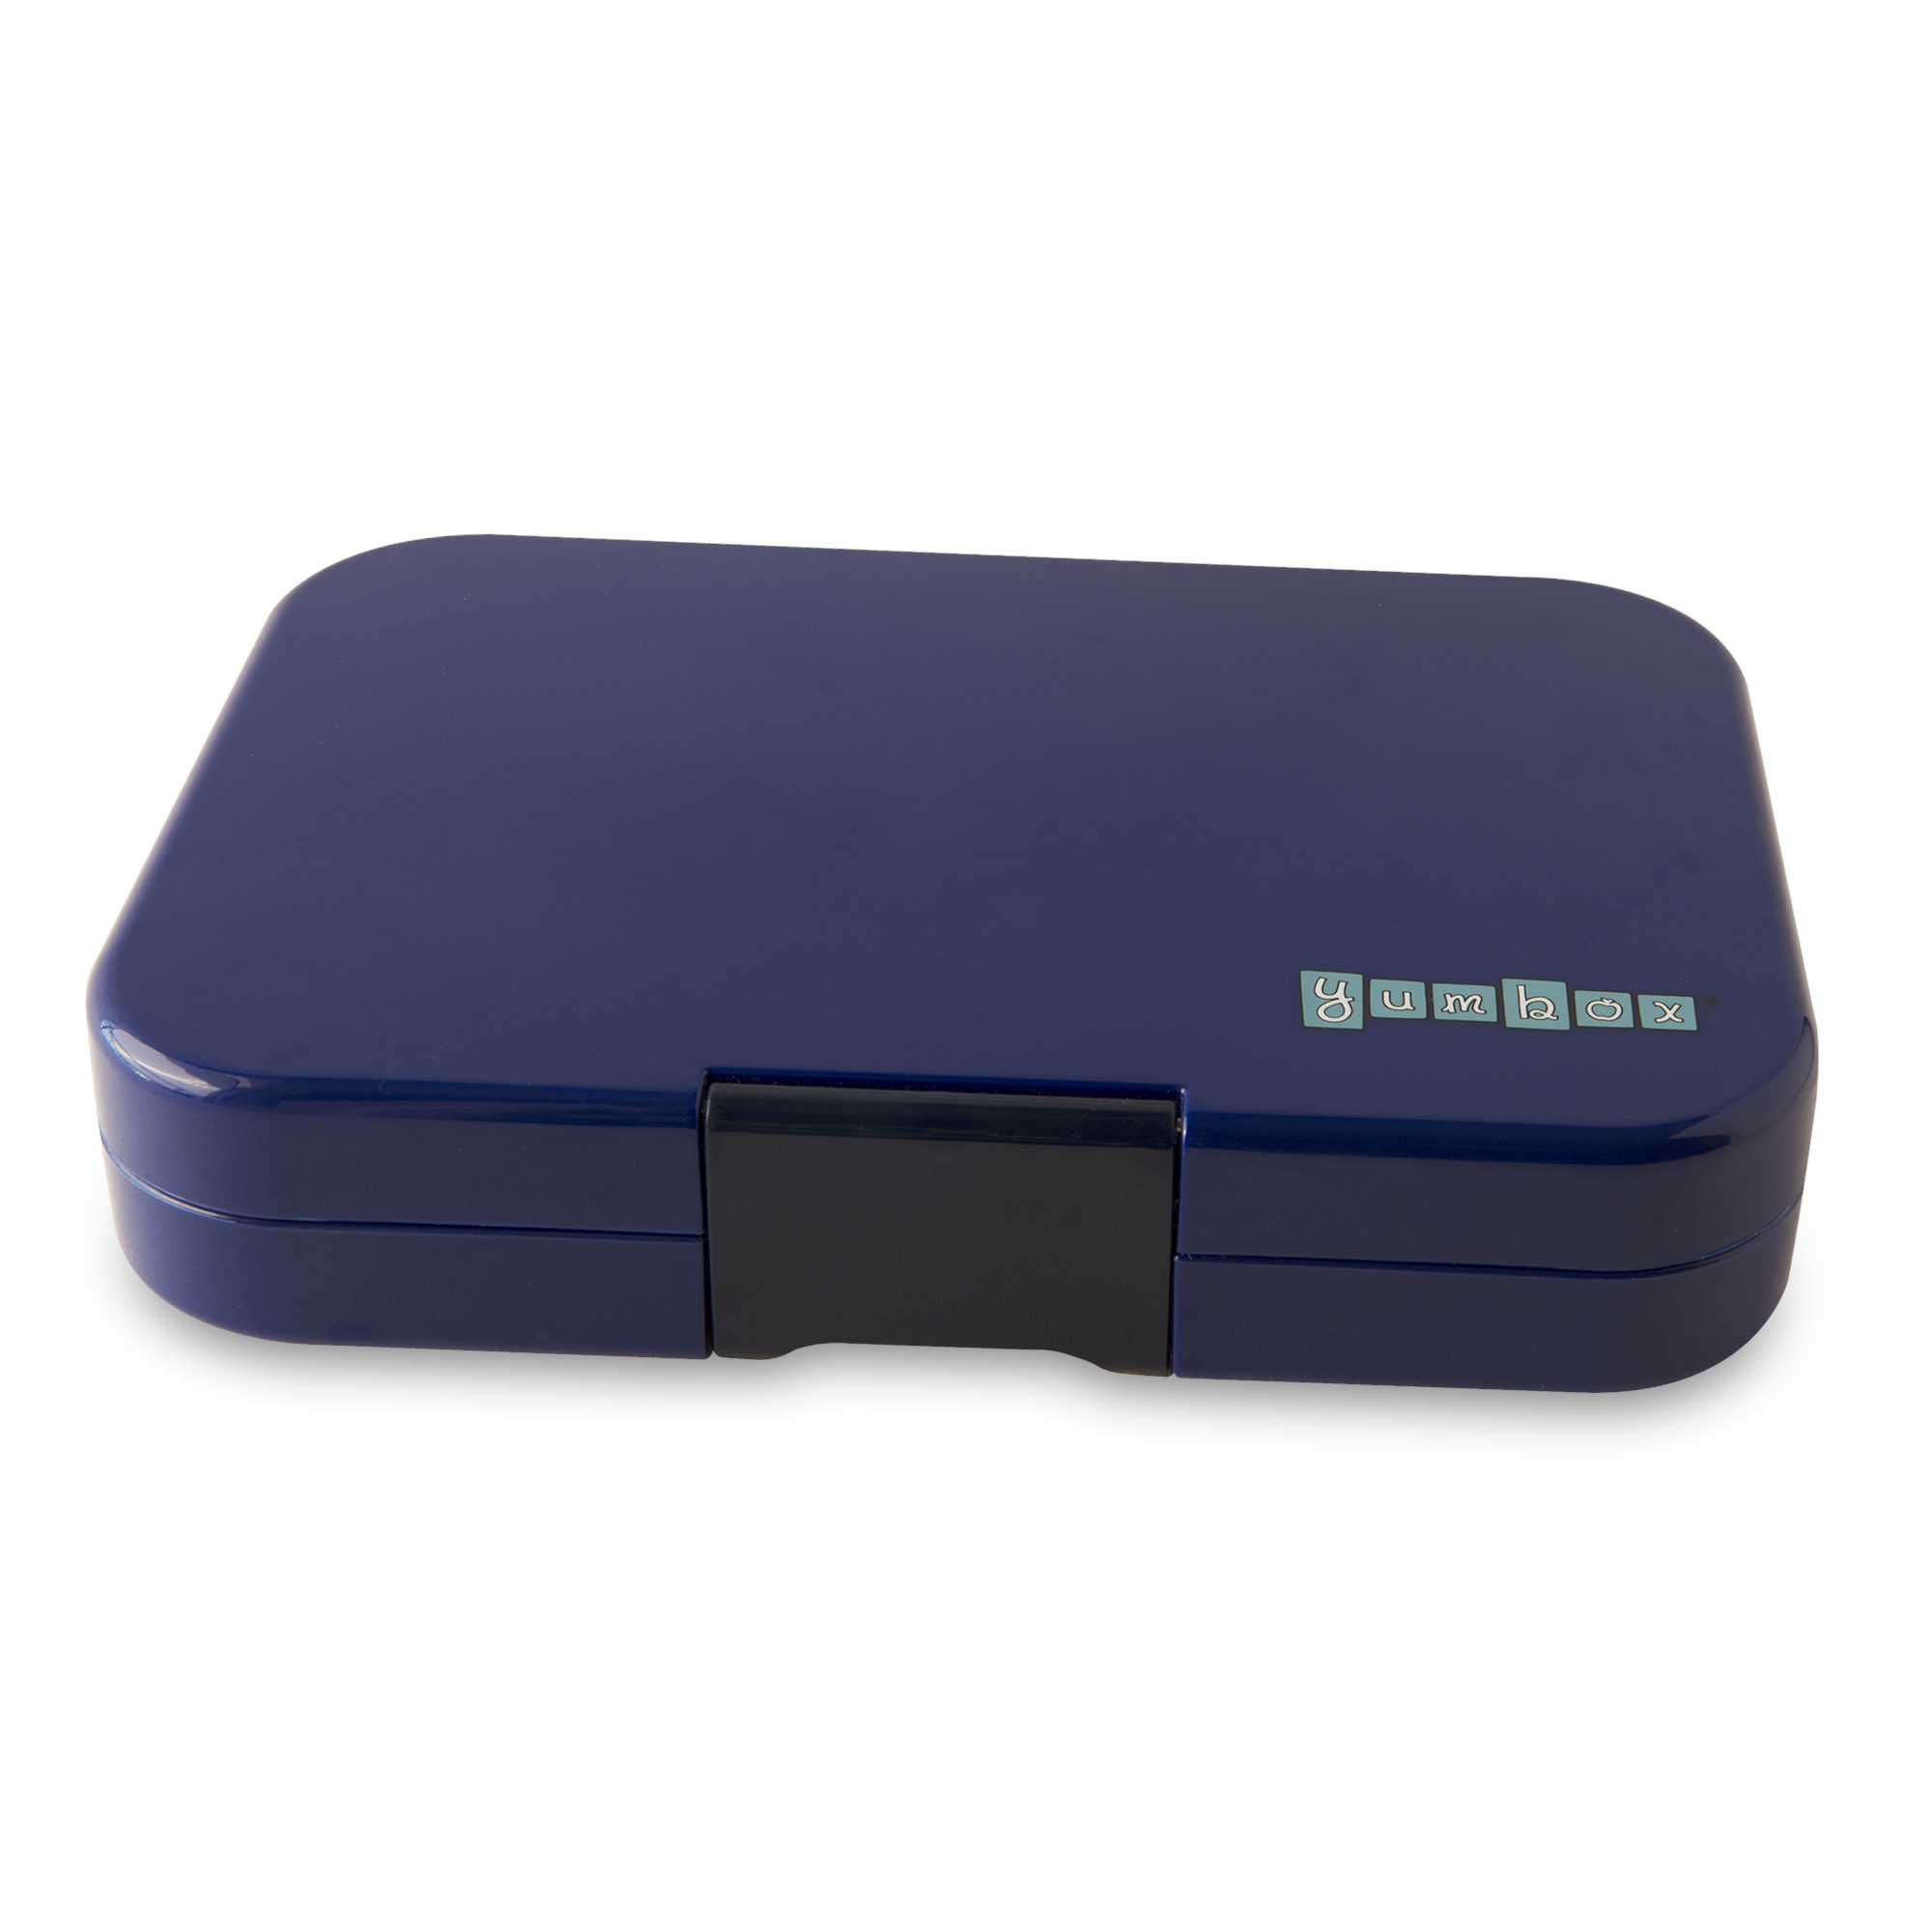 Yumbox Tapas XL 5-sections Portofino blue / Bon appetit tray-3